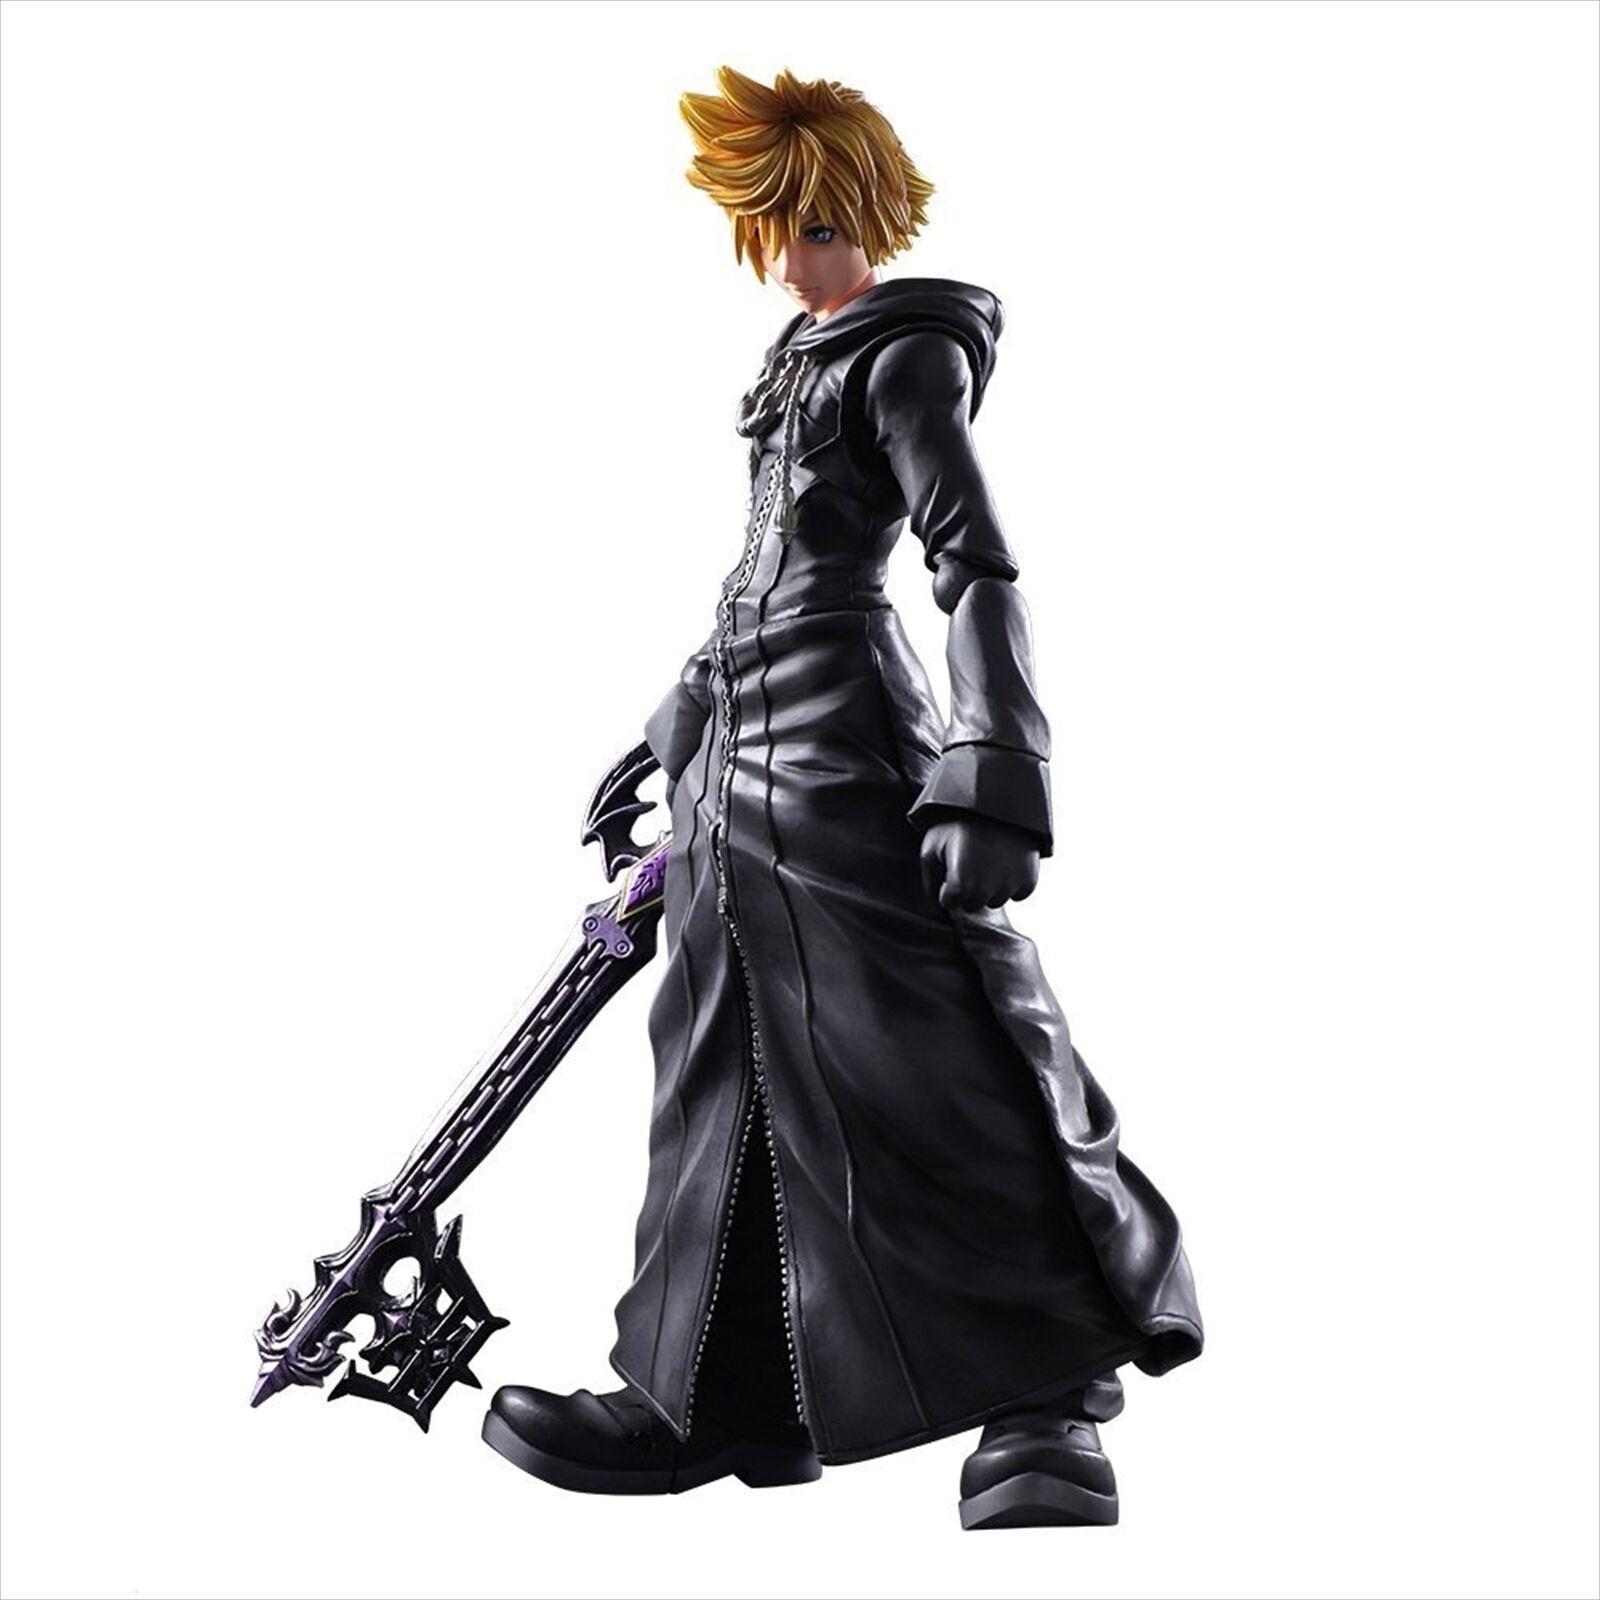 Square Enix Play Arts Kai Reino heartsii Roxas Organización XIII Ver. figura